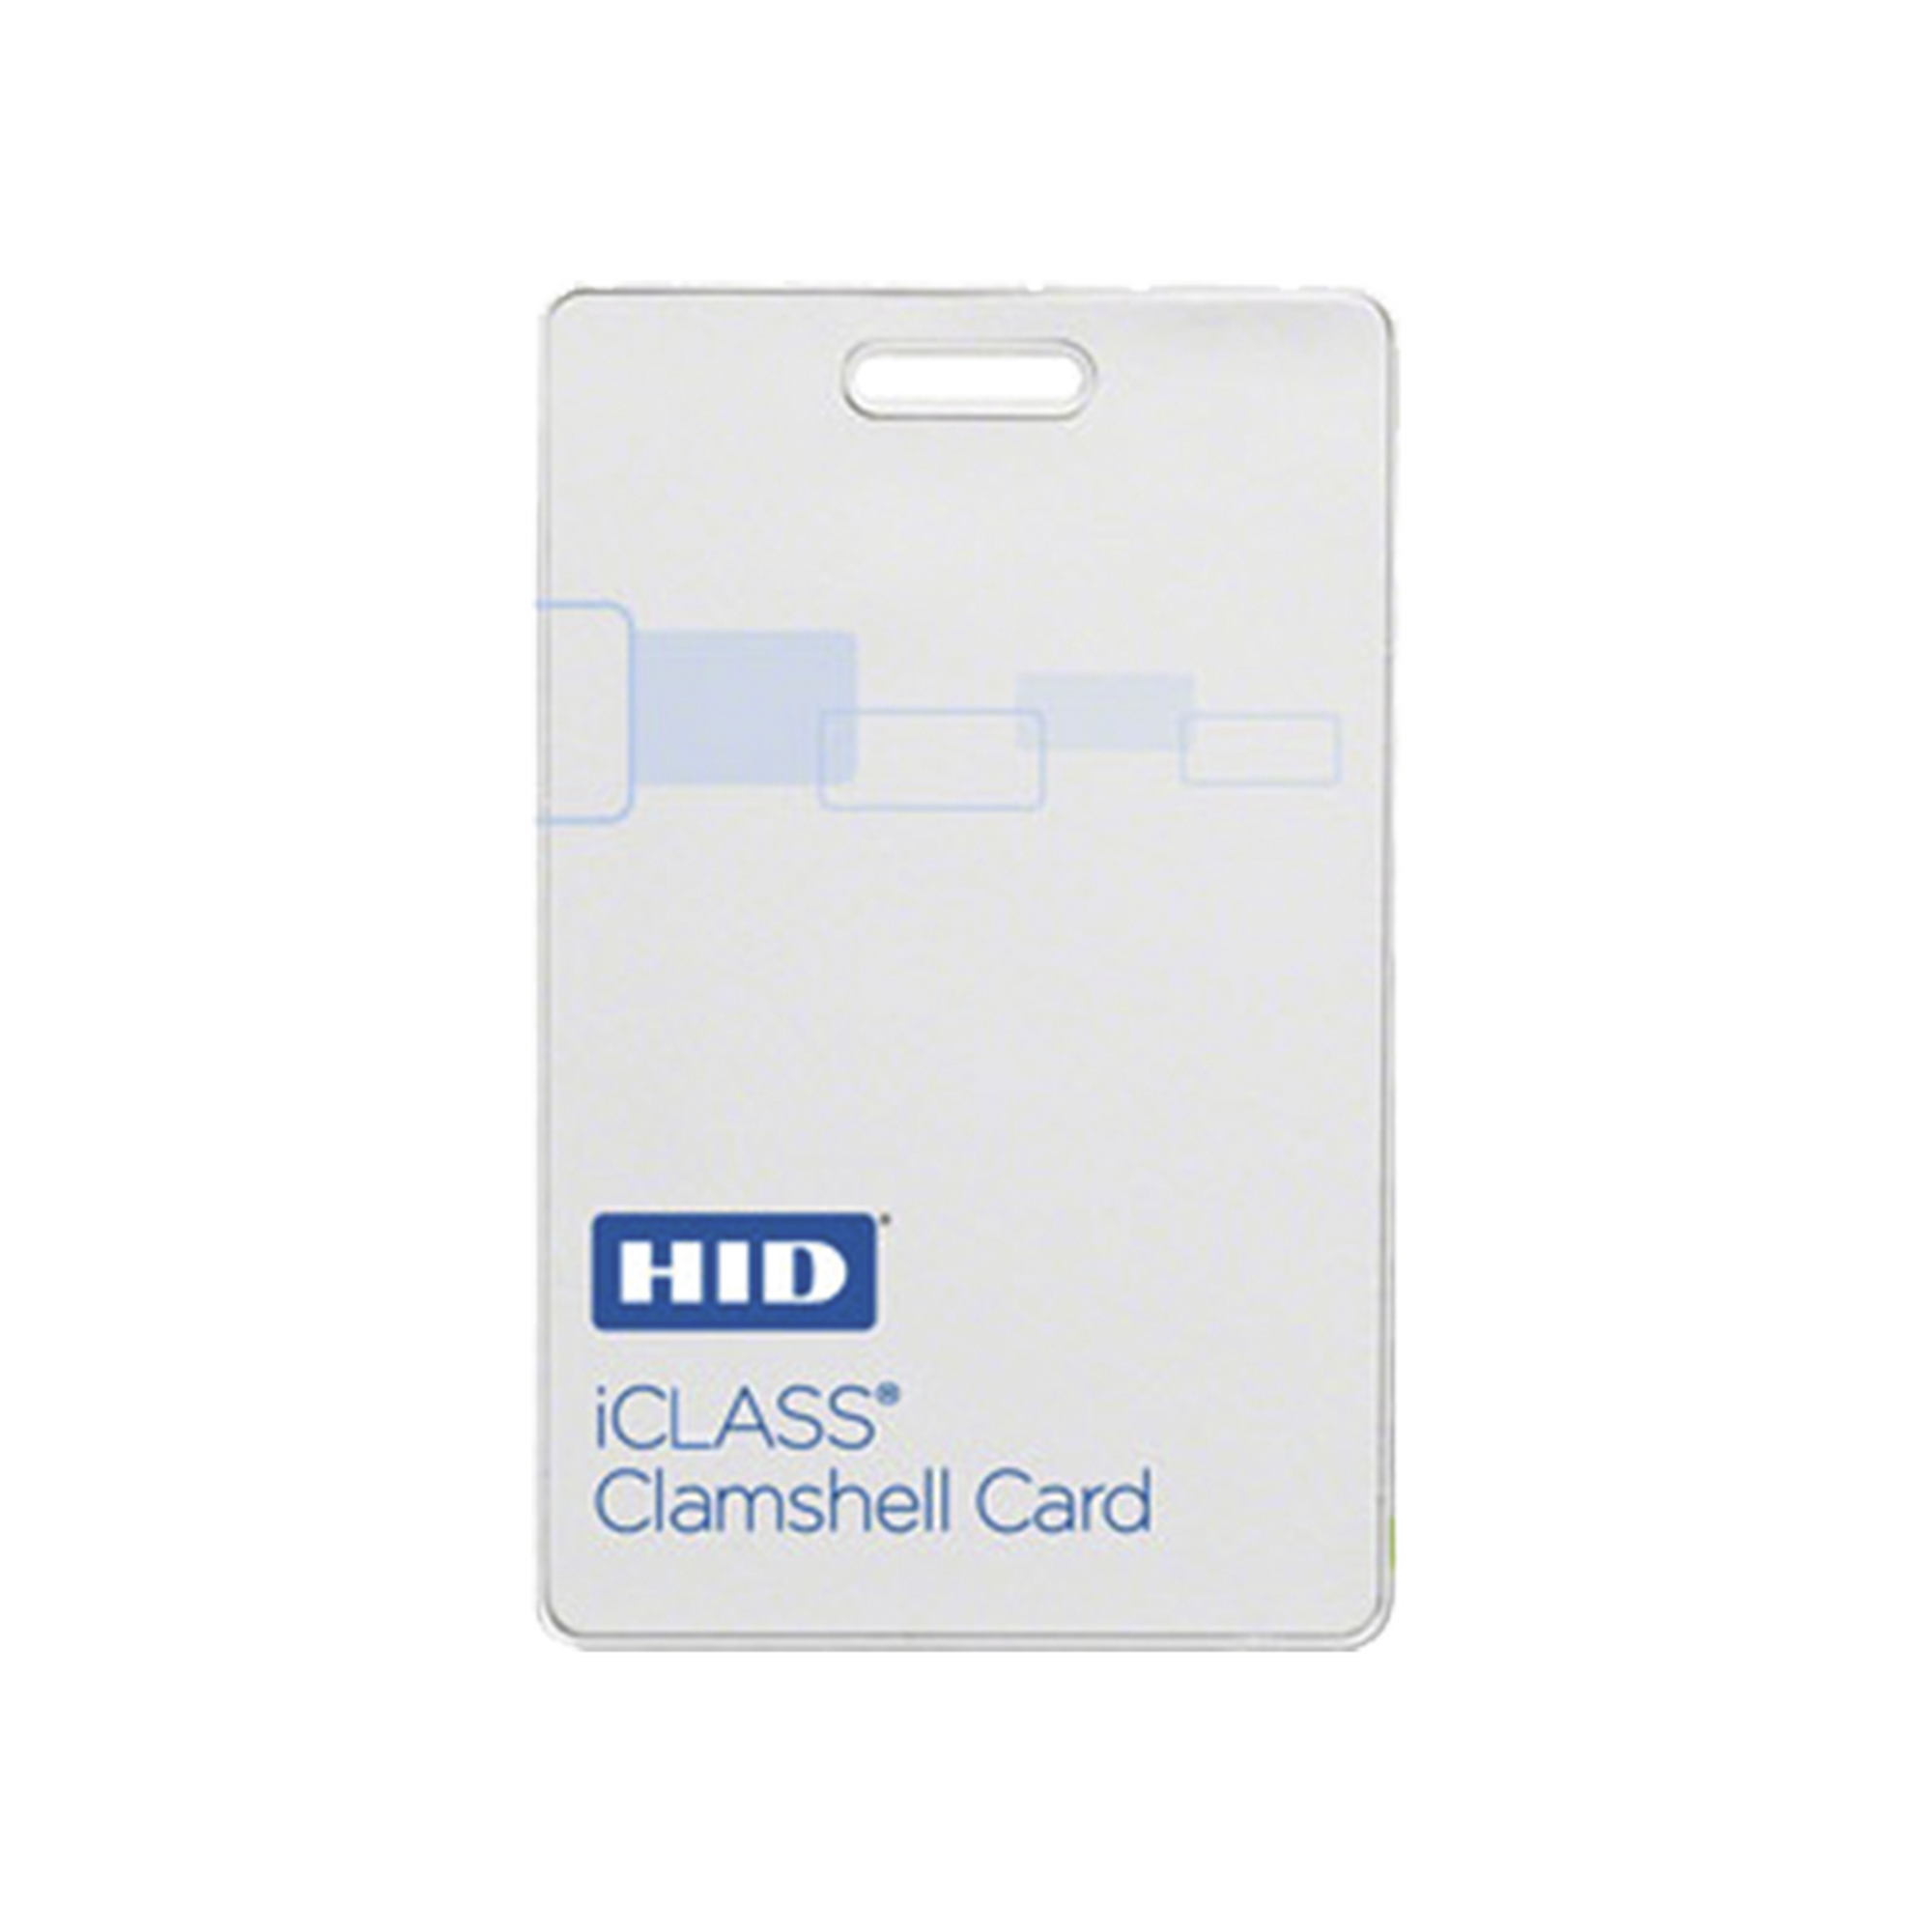 Tarjeta iClass Clamshell (Gruesa) / 2 k memoria / Programada  a 26 bits Aleatoriamente/ Garantía de por Vida